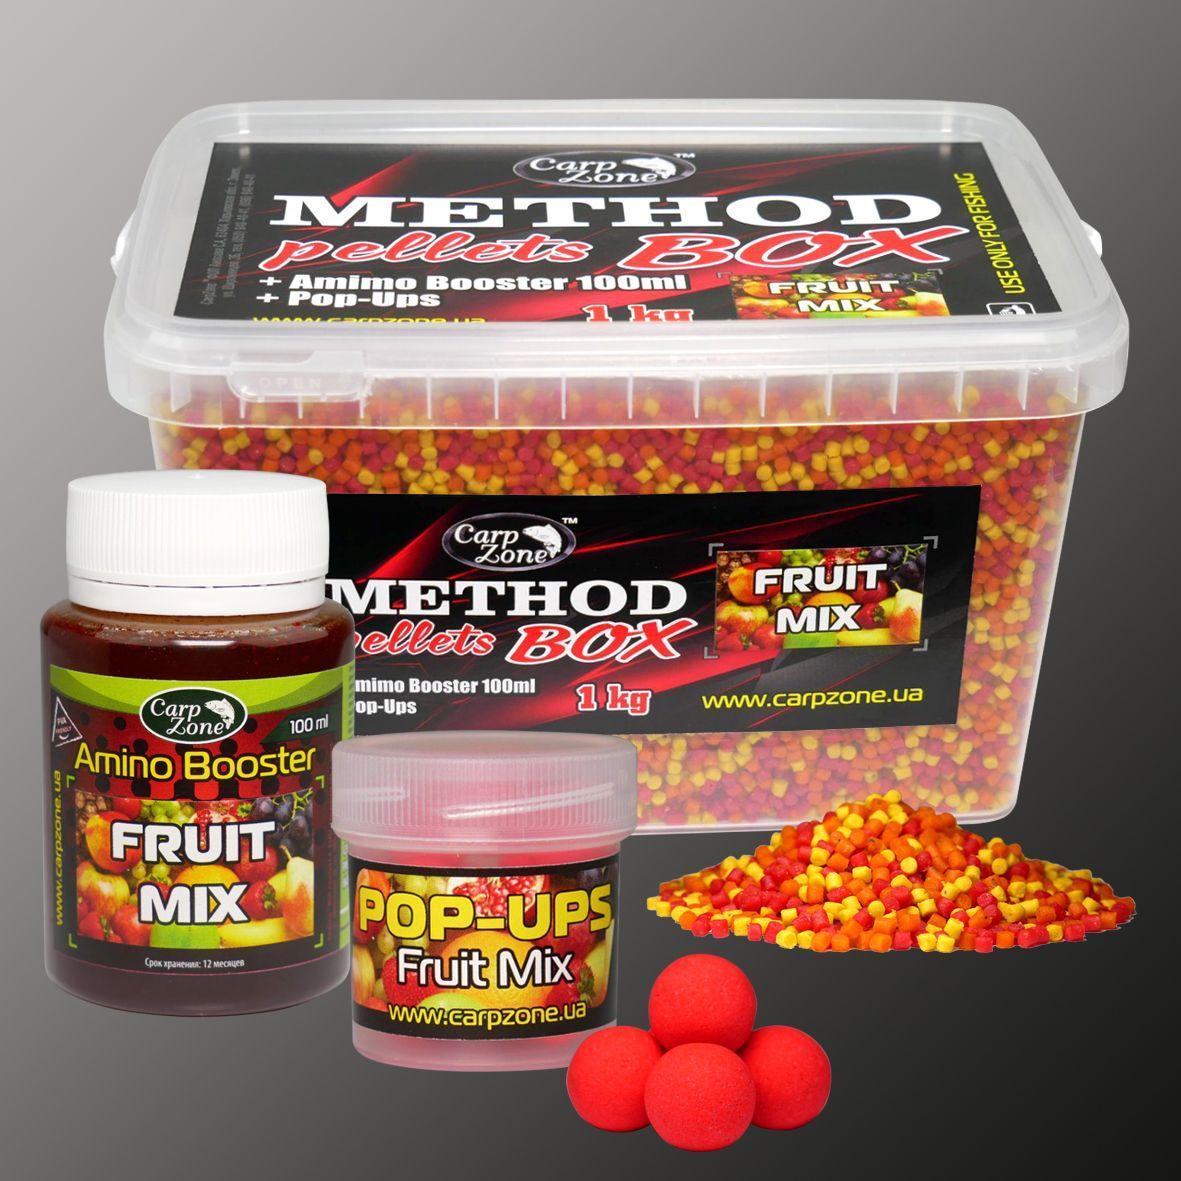 Набор Method Pellets Box Fruit Mix (Фруктовый микс) 3mm/1kg + Amino Booster 100ml + Pop-Ups 10mm/15pc